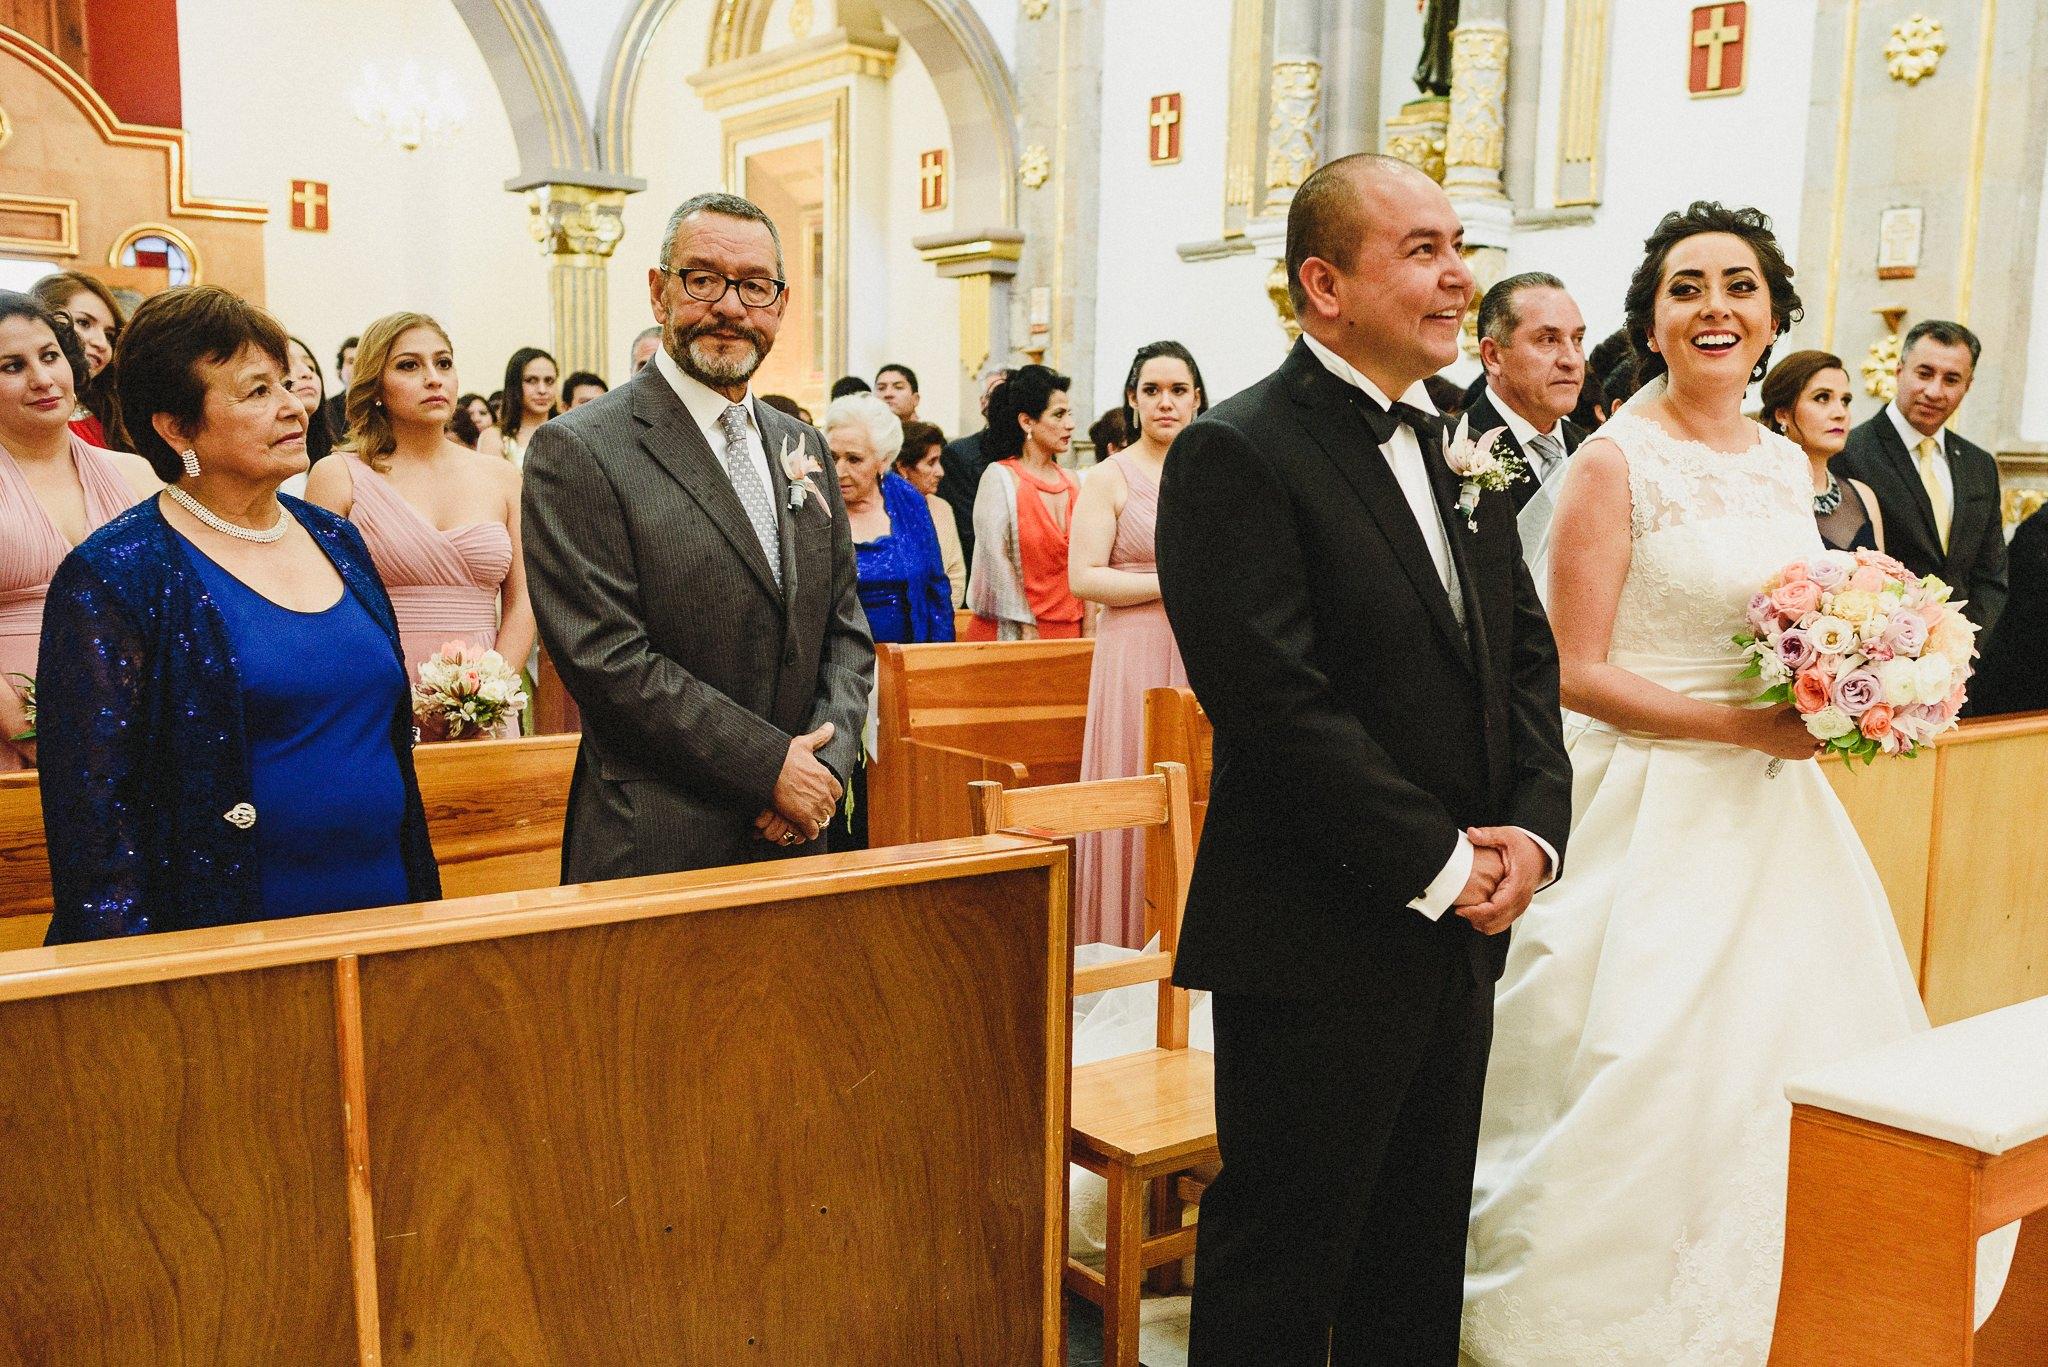 Wedding-Boda-Tulancingo-Hidalgo-Salon-Essenzia-Luis-Houdin-20-film